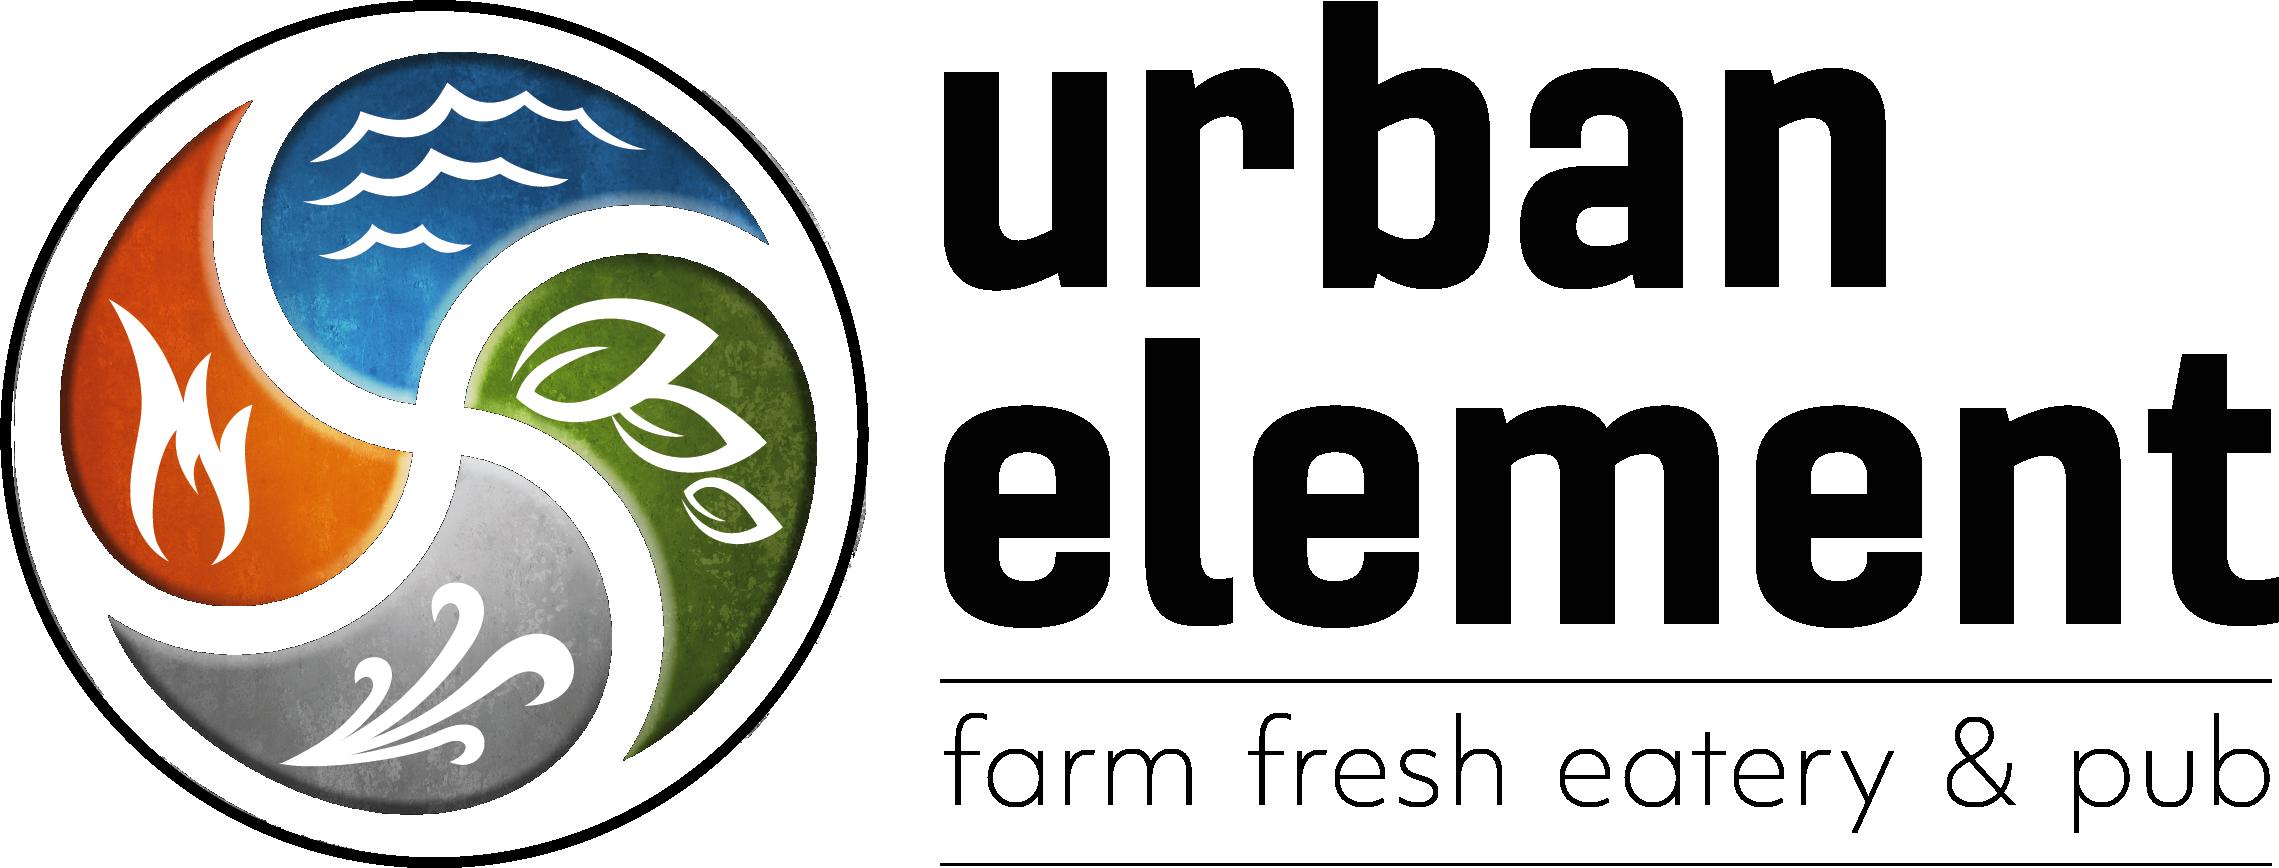 urban element